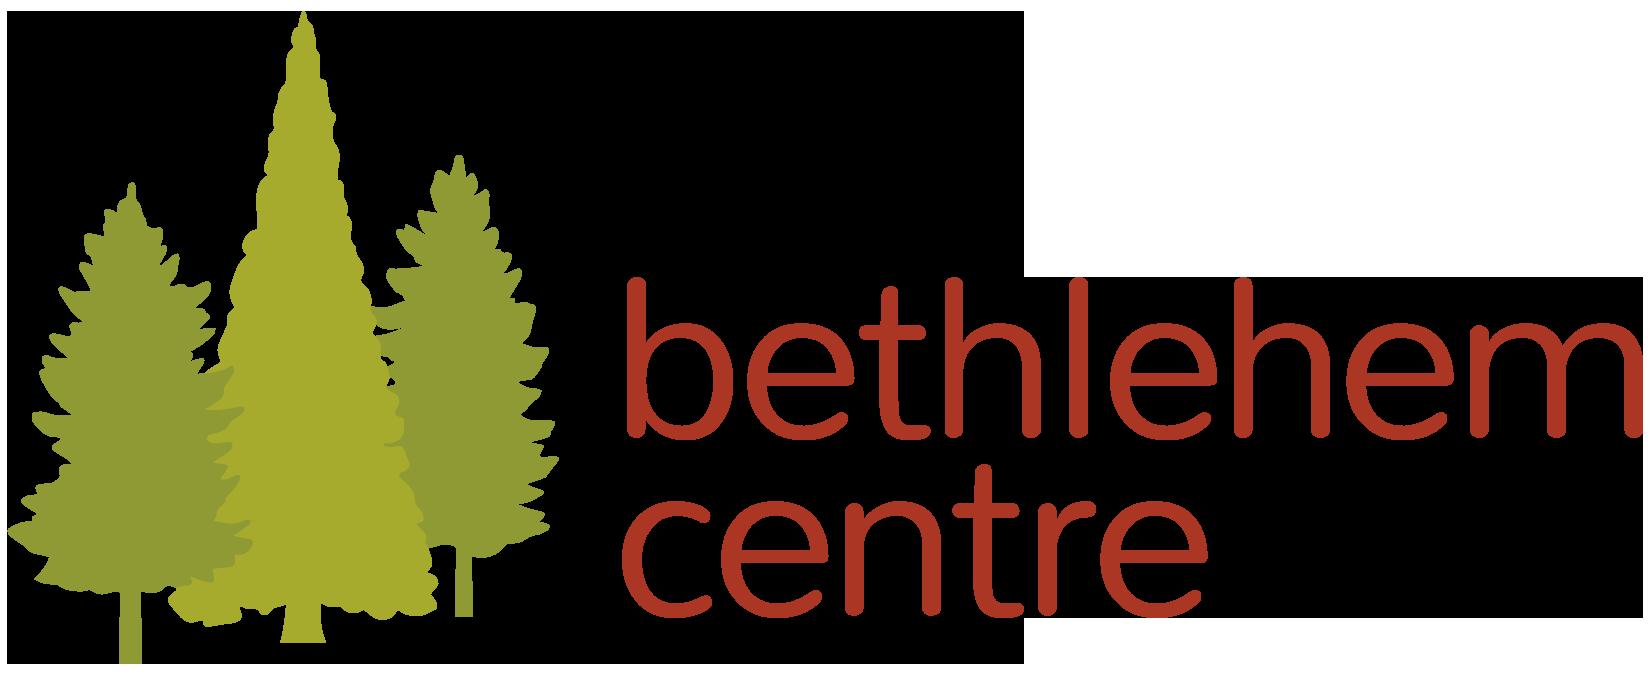 Bethlehem Centre Nanaimo, BC